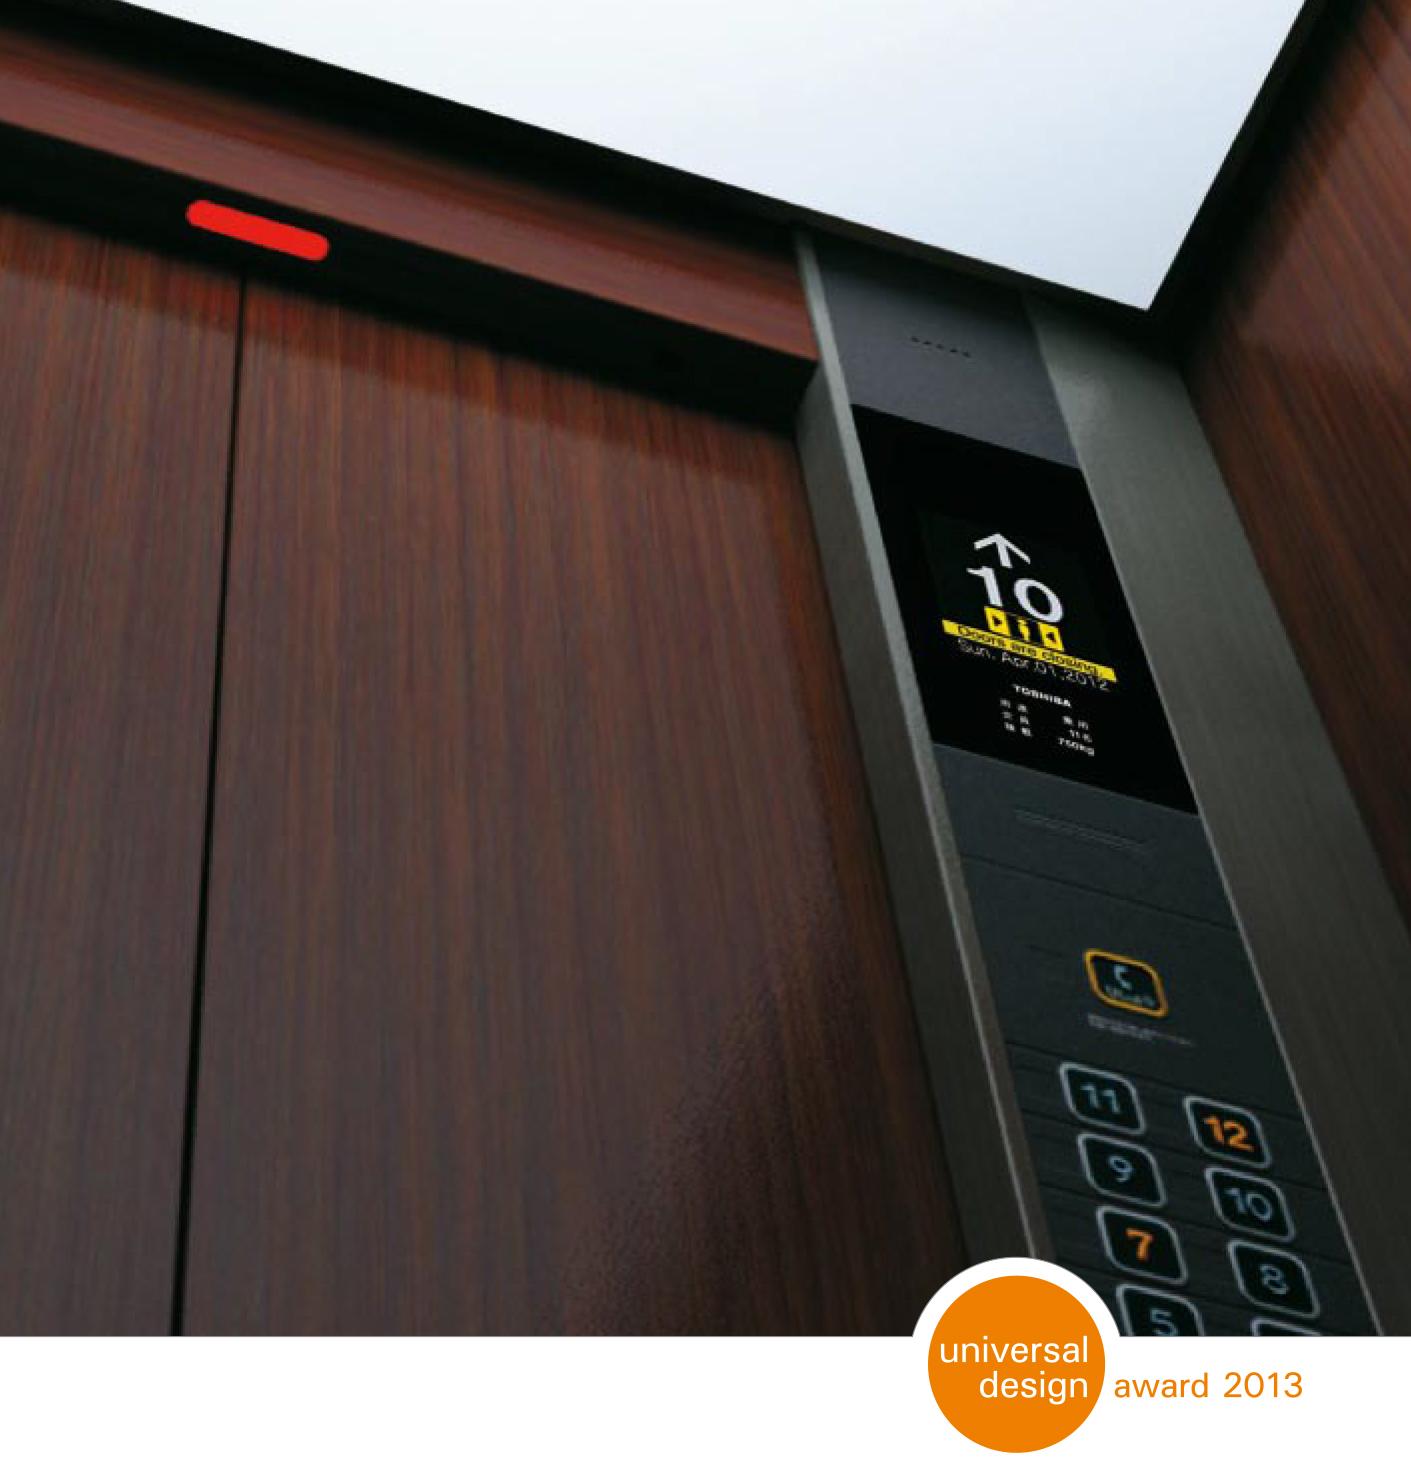 Foto - Fahrstuhl 1 © Toshiba Corporation